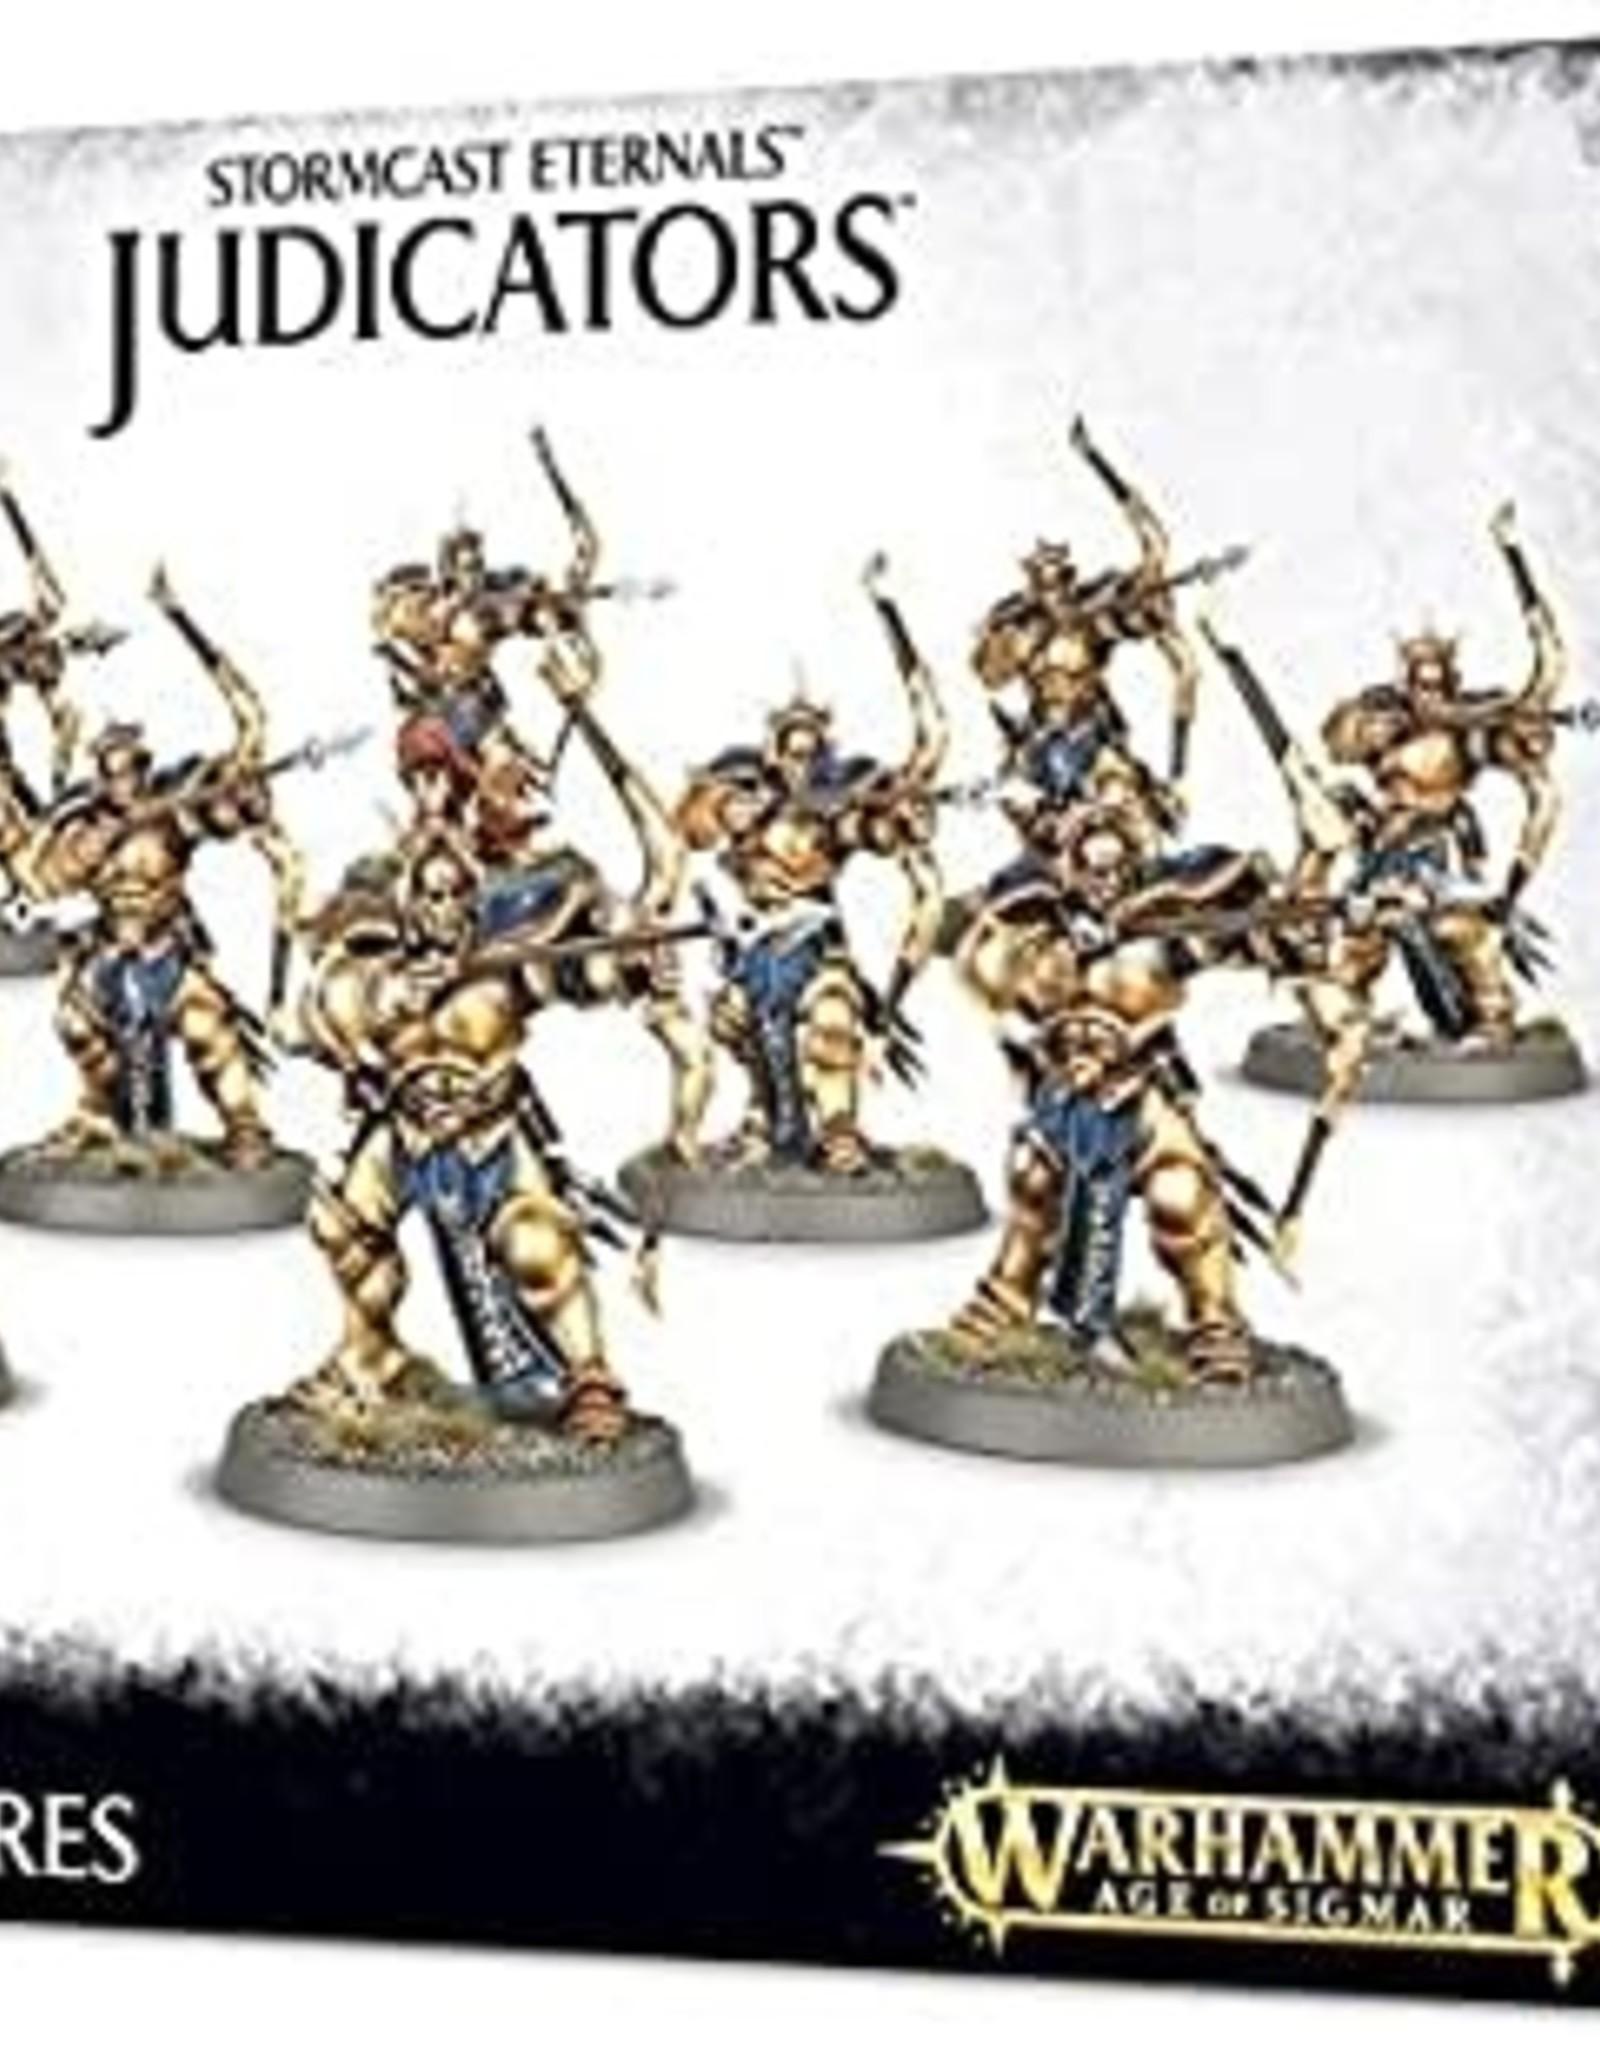 Games Workshop STORMCAST ETERNALS JUDICATORS